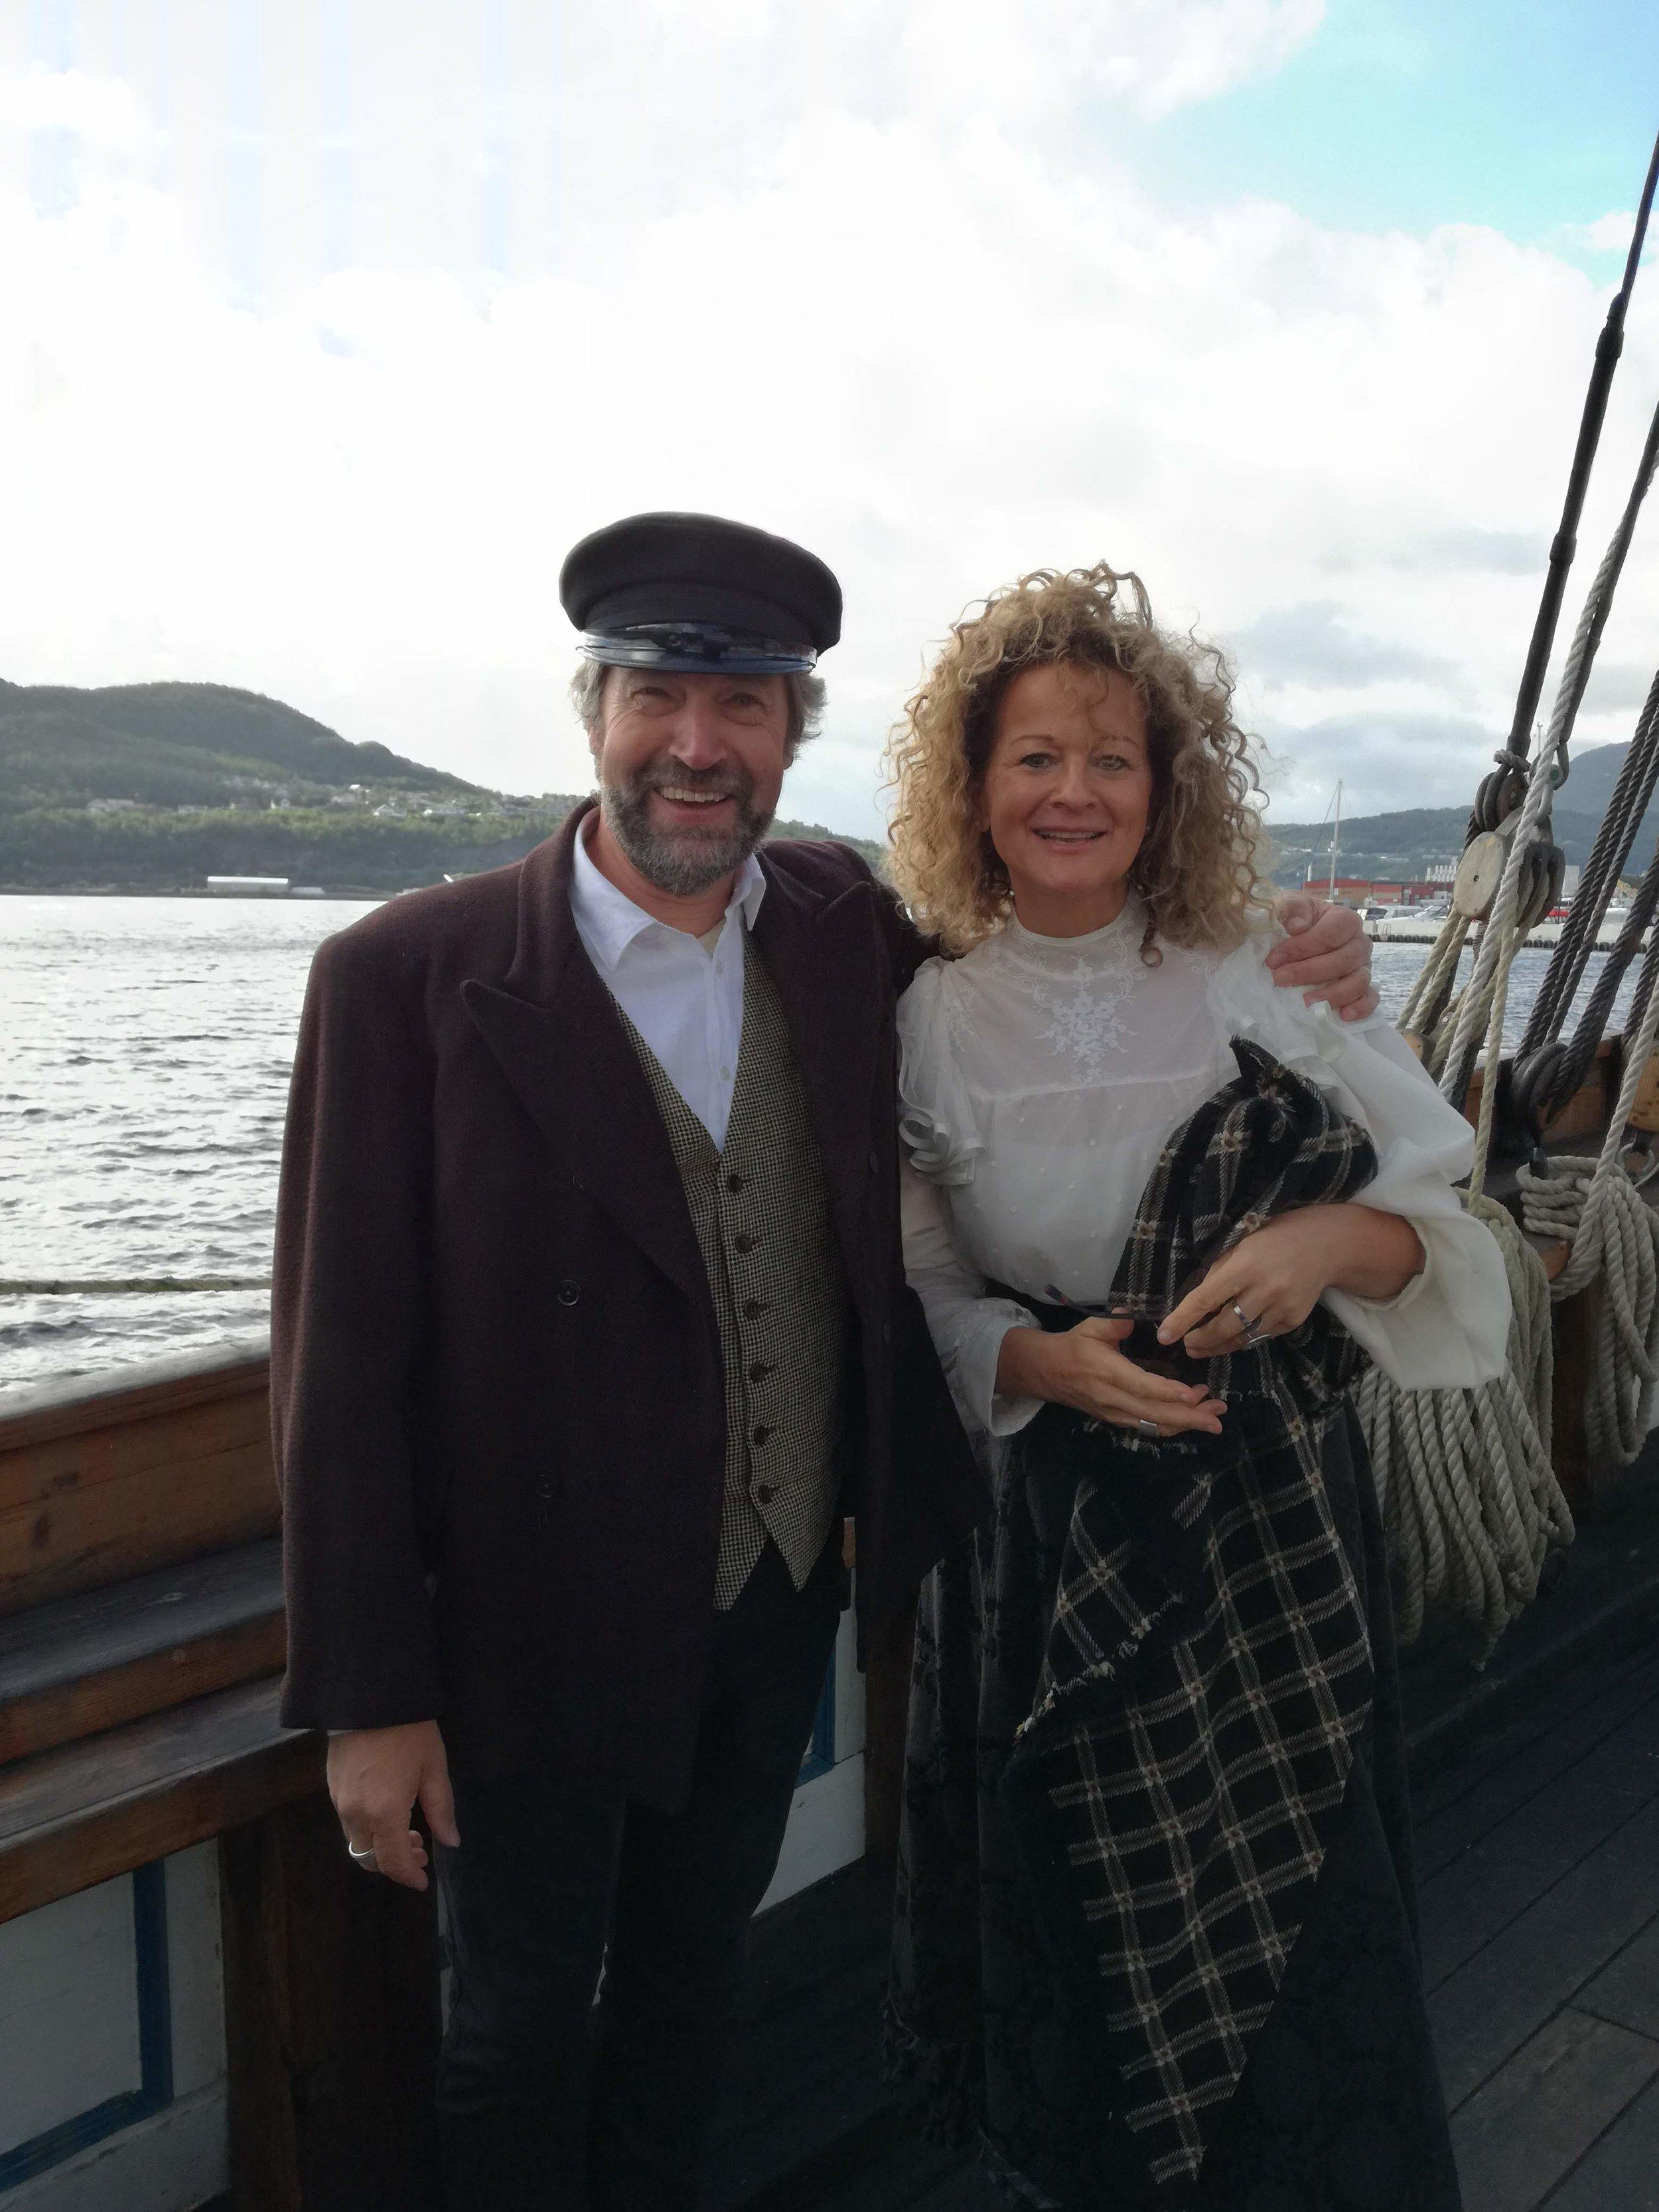 Ola Bremnes med musiker Kristin Skaare